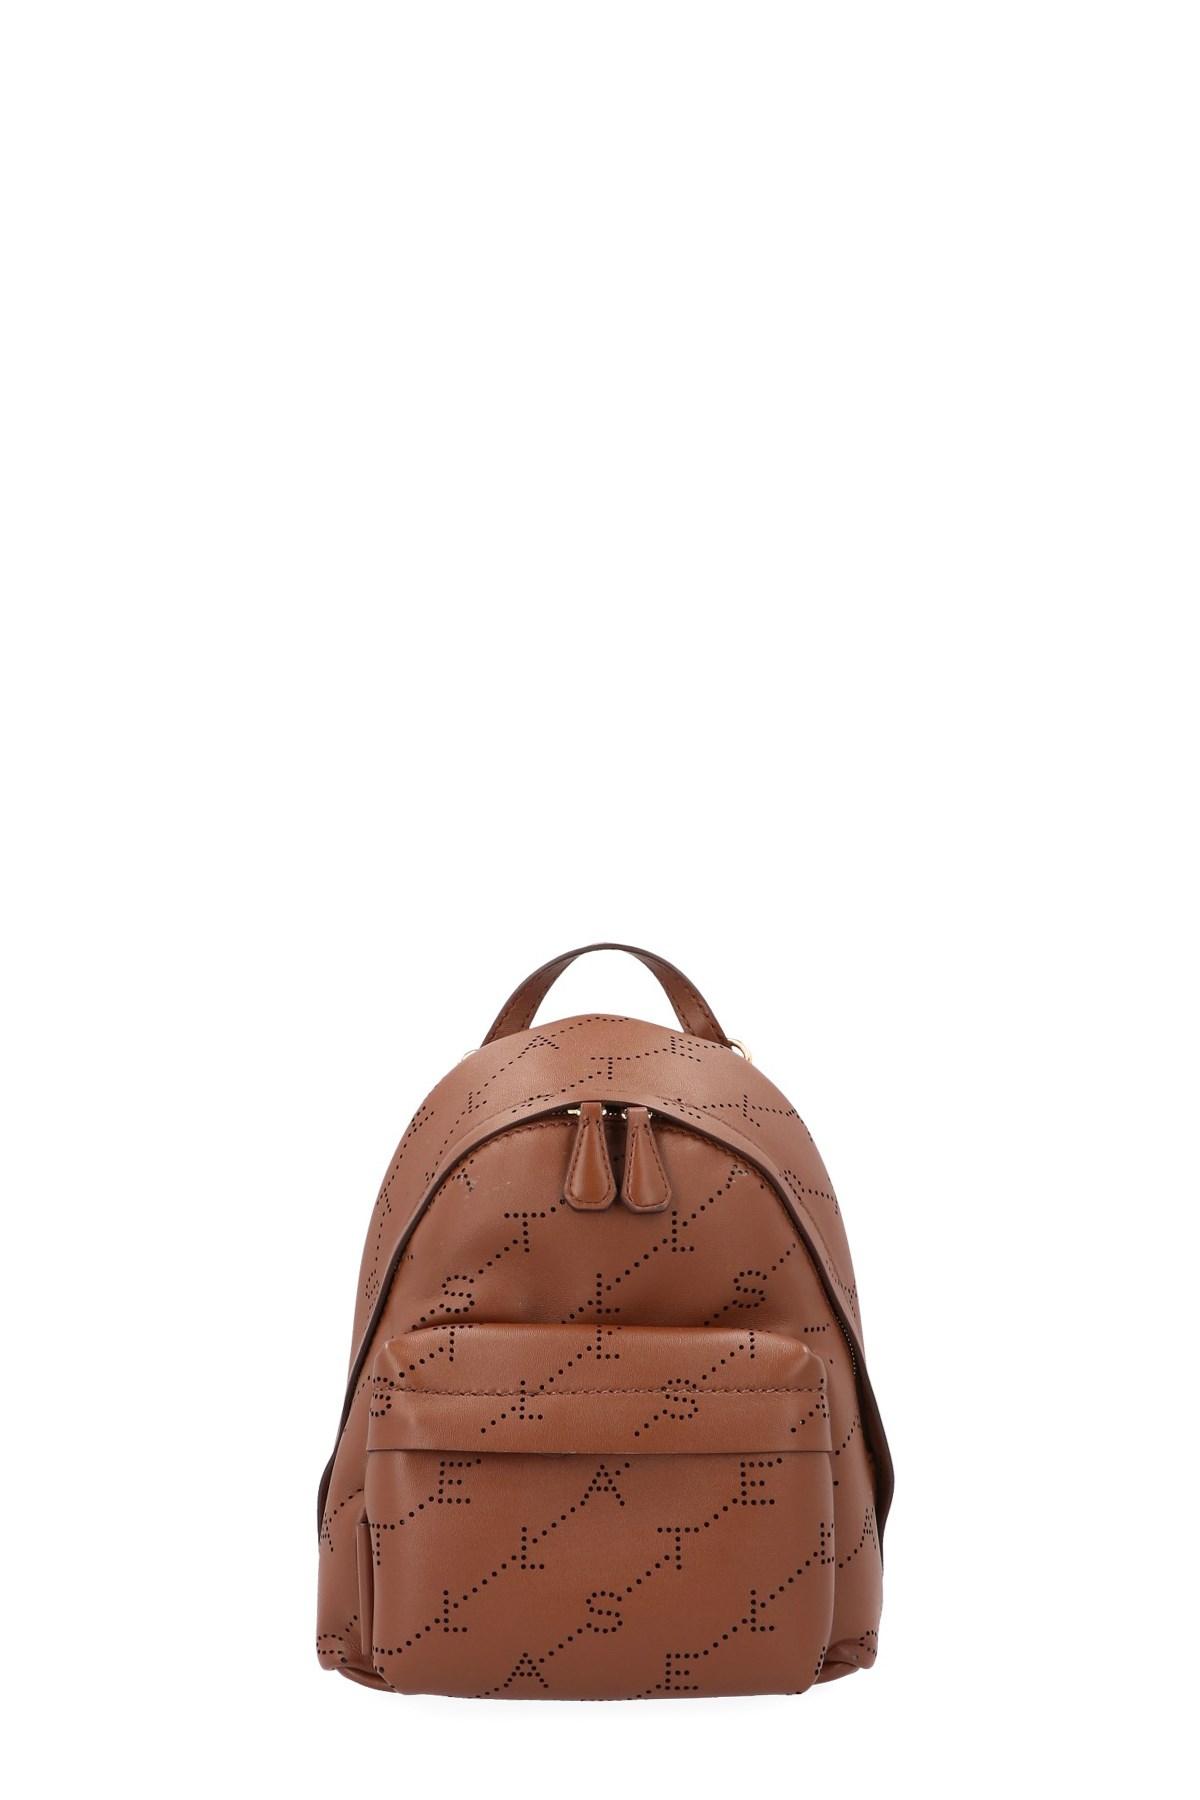 stella mccartney  The logo bag  backpack available on julian-fashion ... 5c6508f8fa846